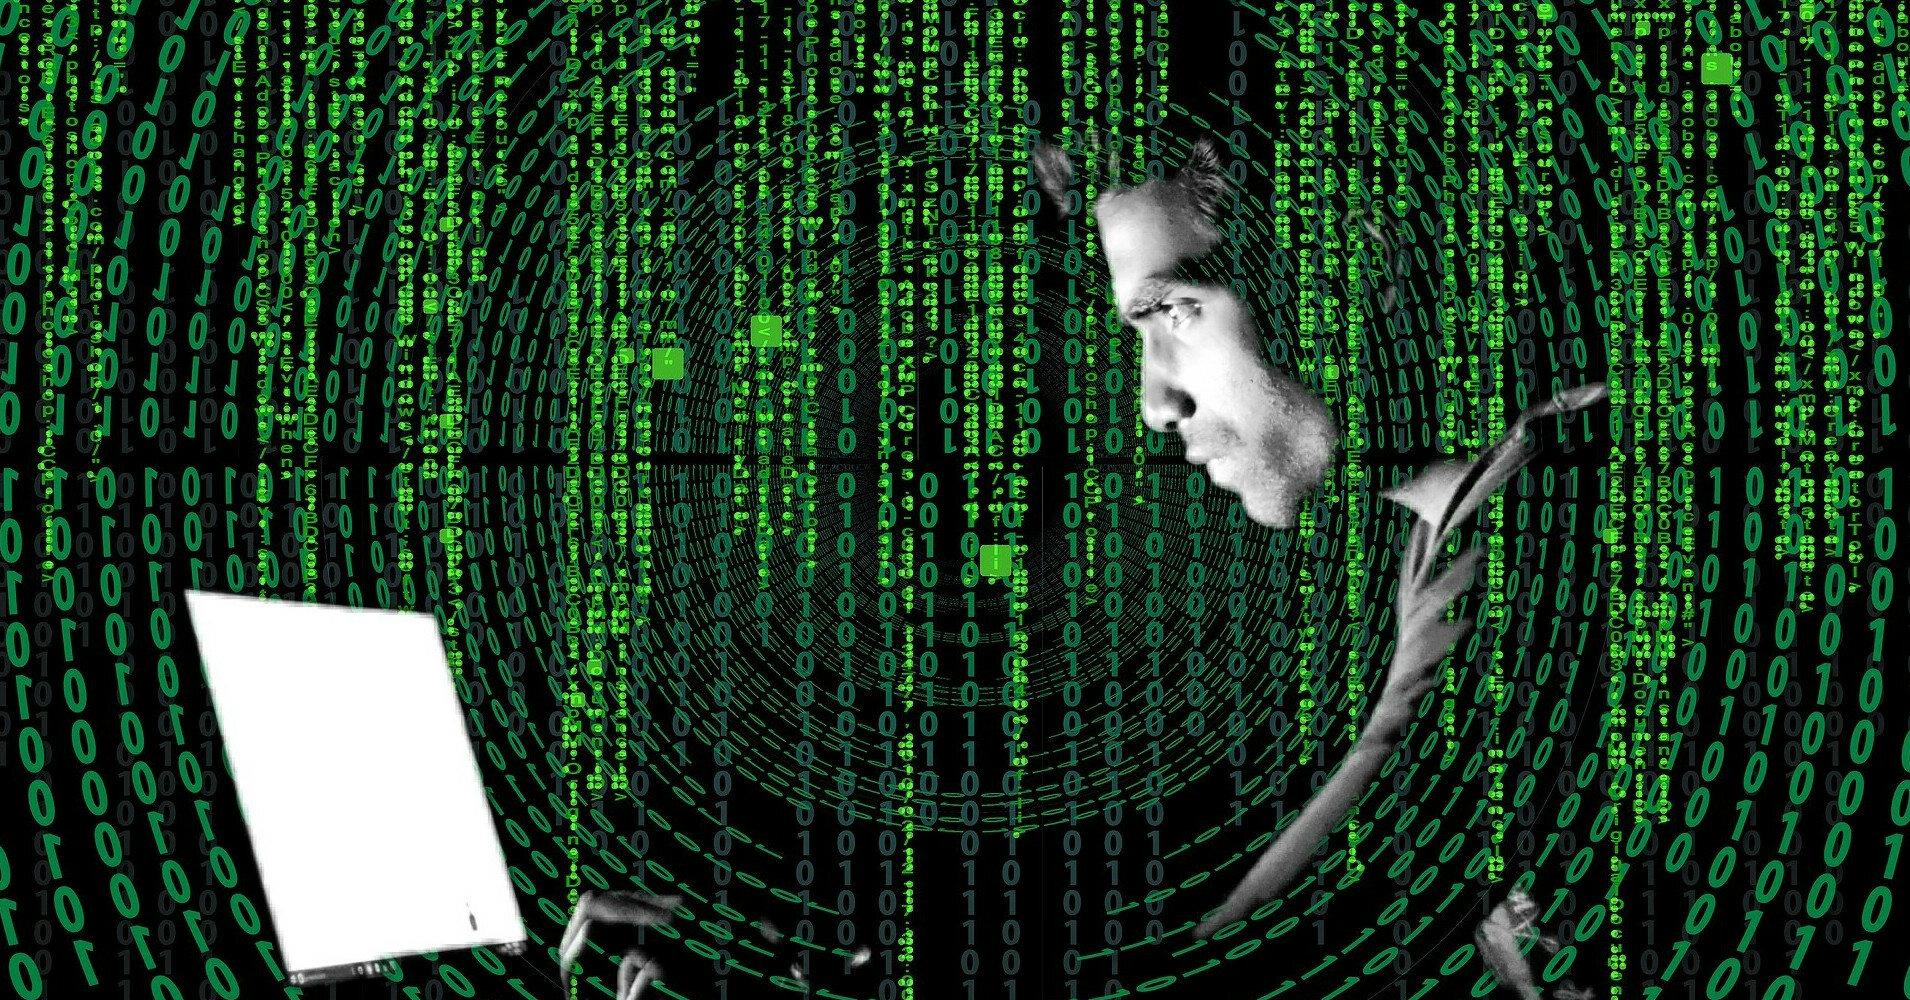 На киевский дата-центр идет DDOS-атака